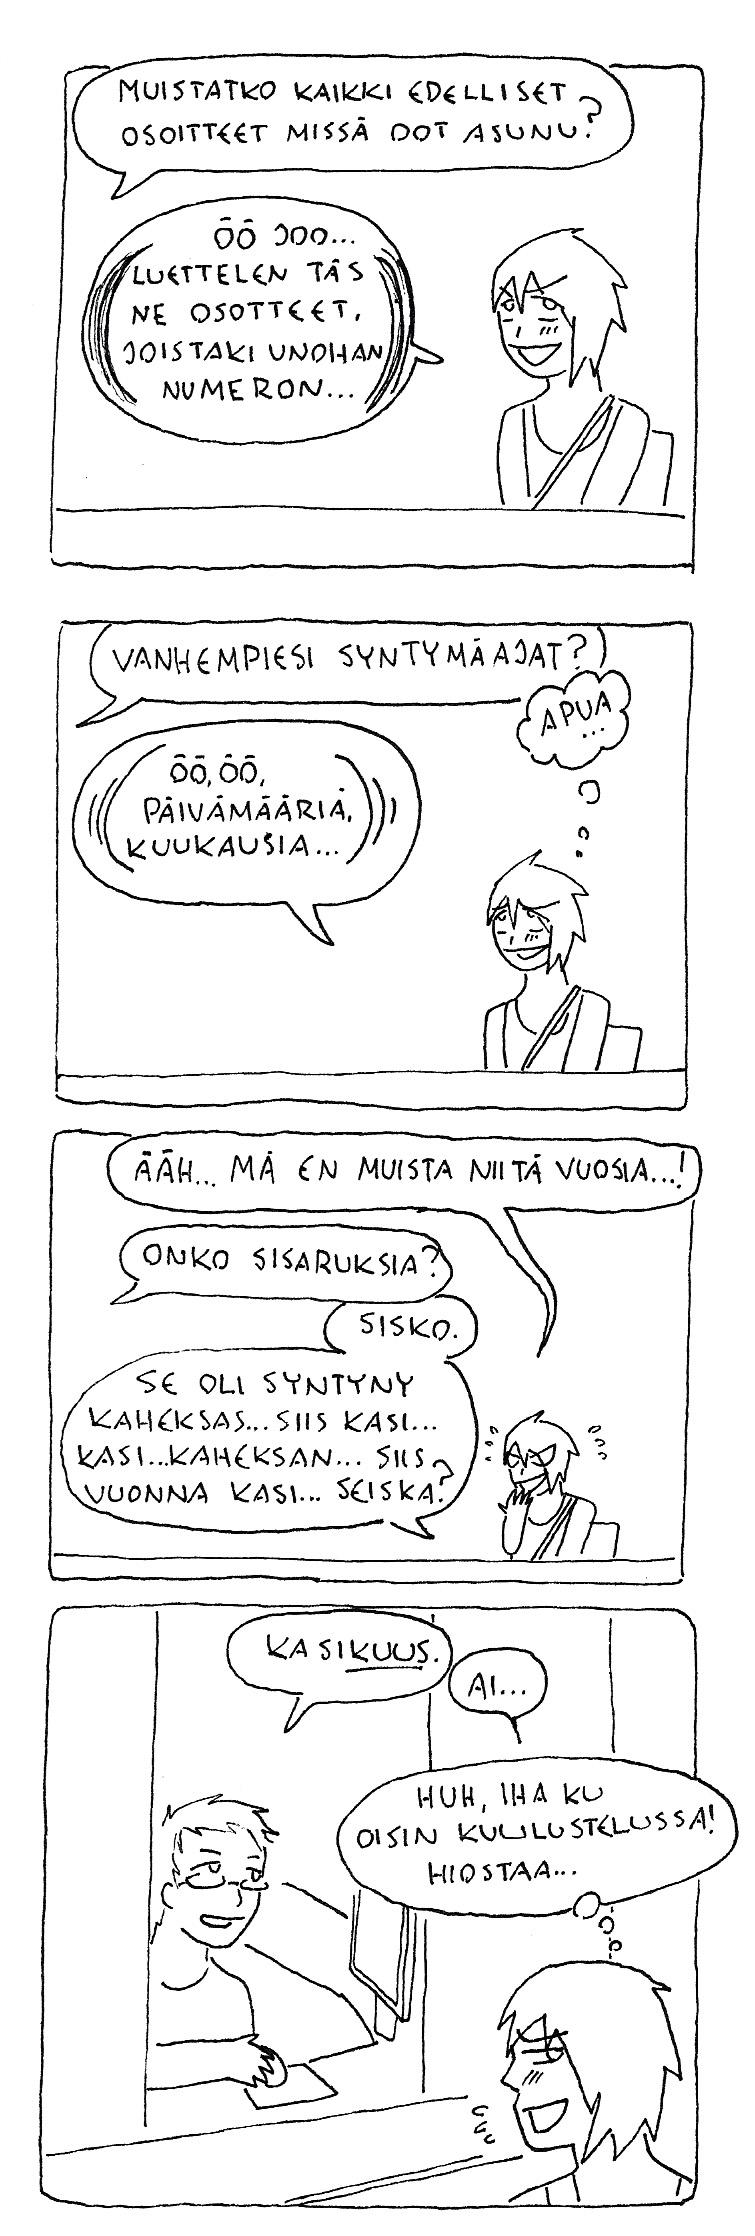 saerjis44